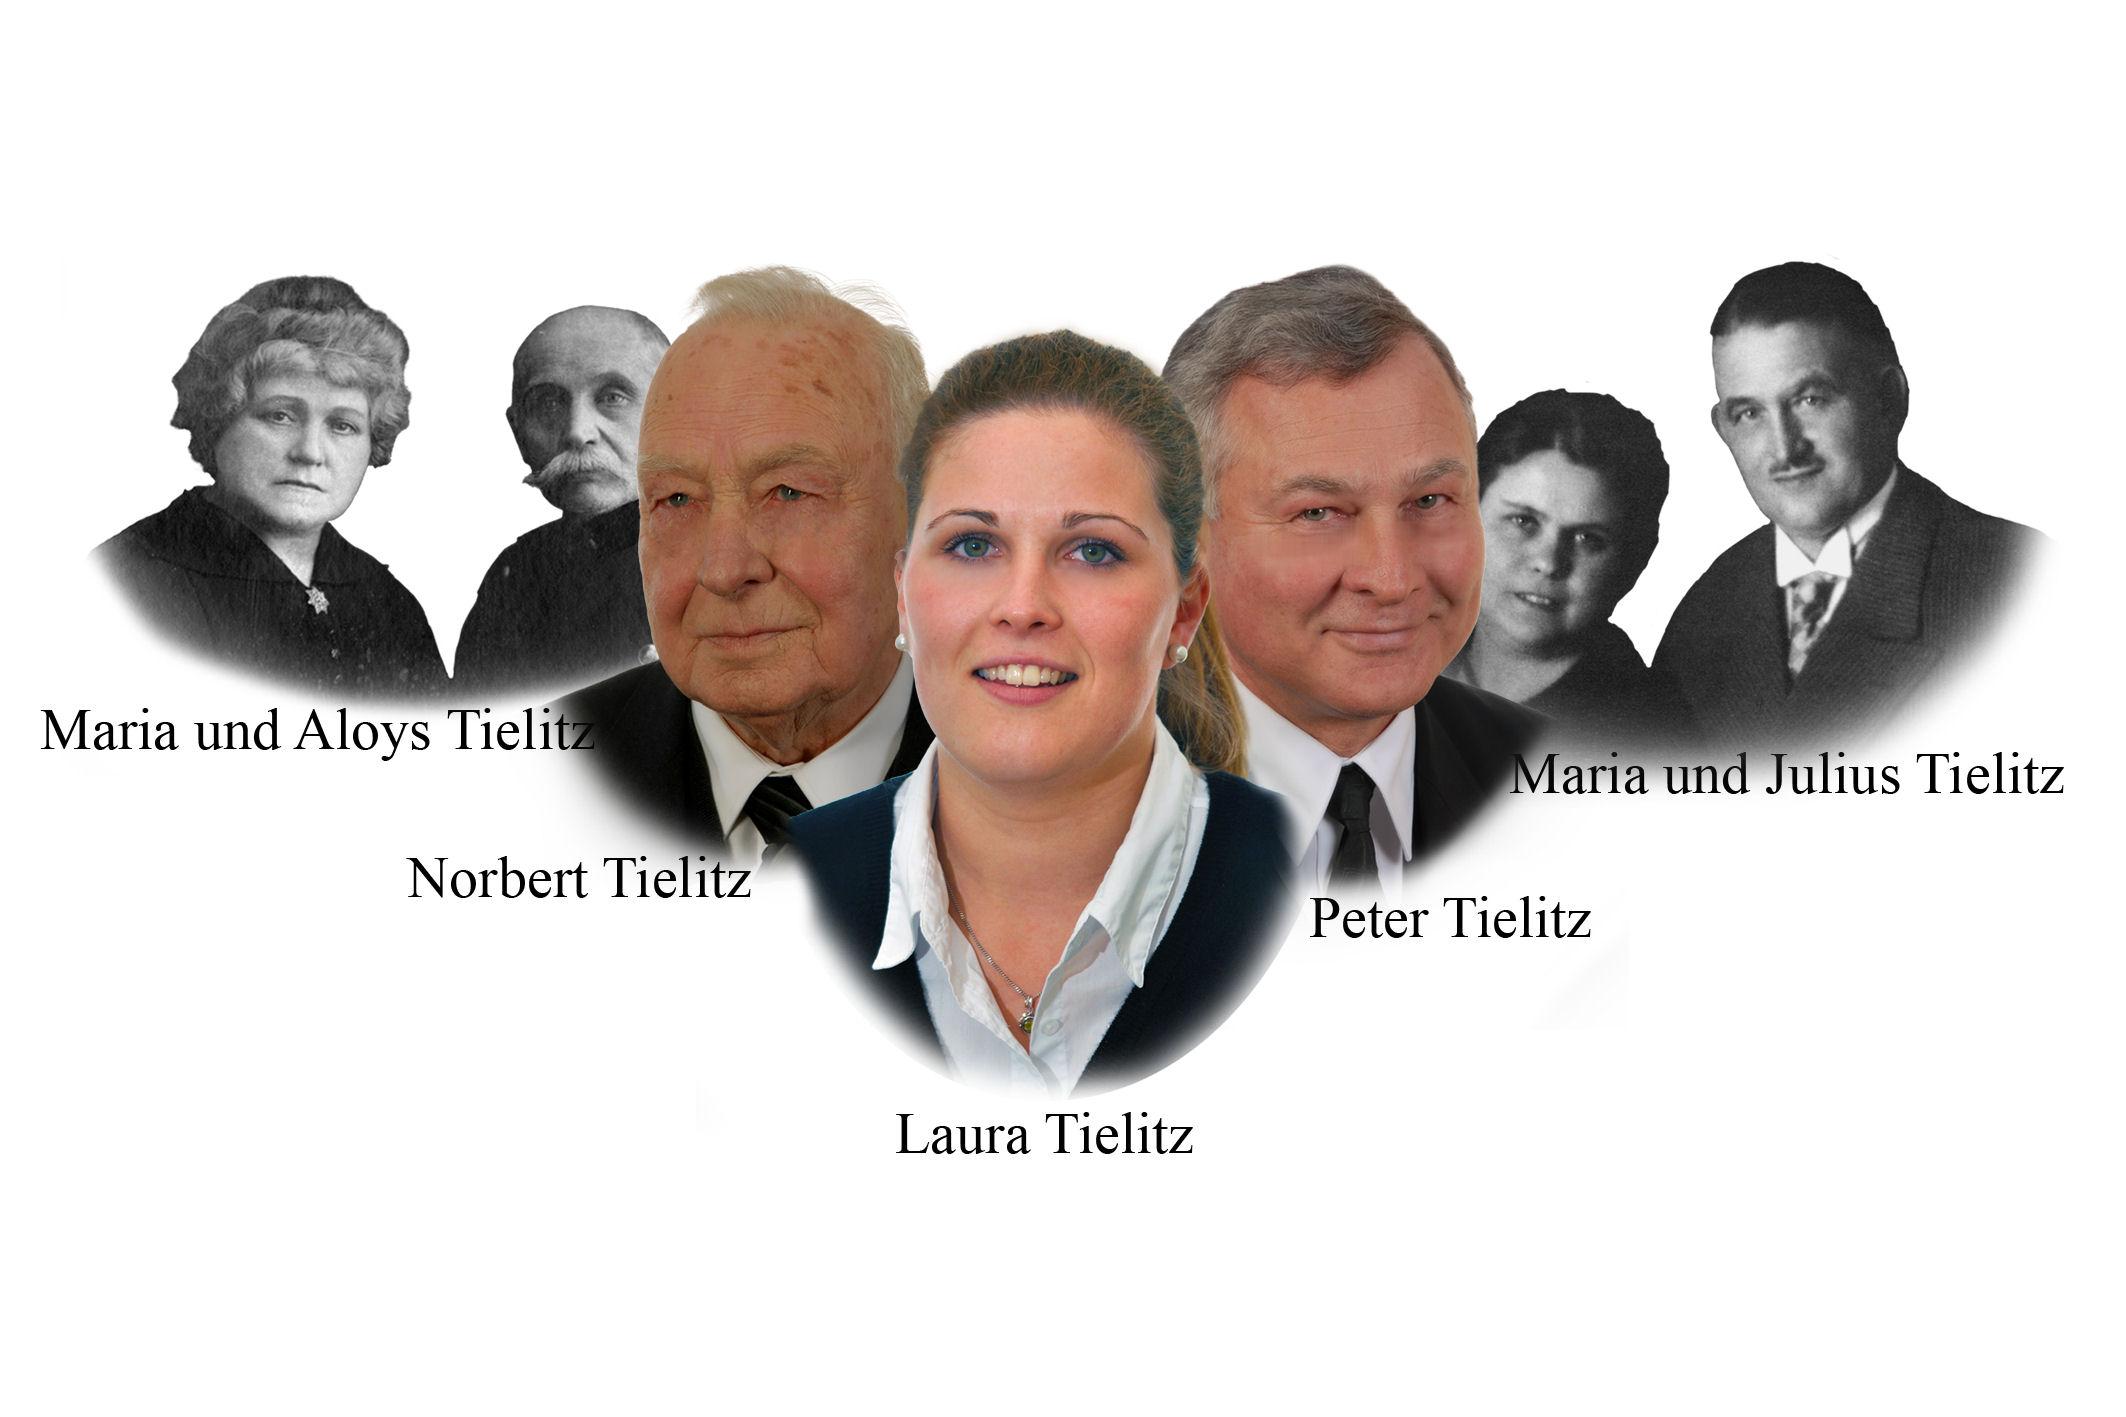 Beerdigungs-Institut Tielitz oHG